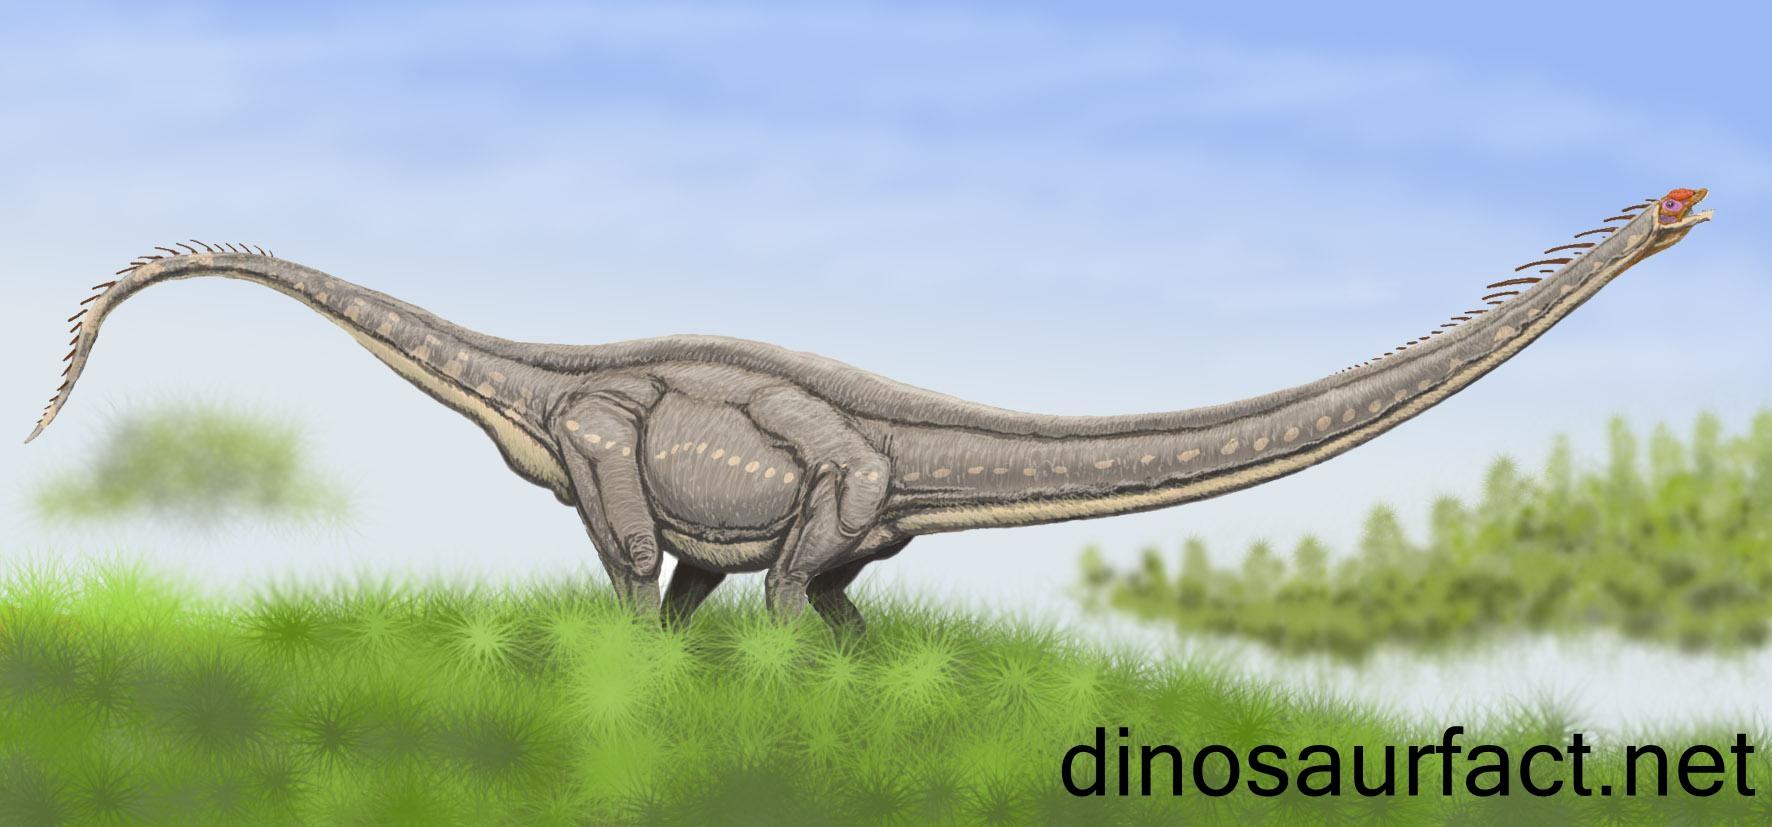 dinosaur train argentinosaurus dinosaur train nodosaurus dinosaur ...